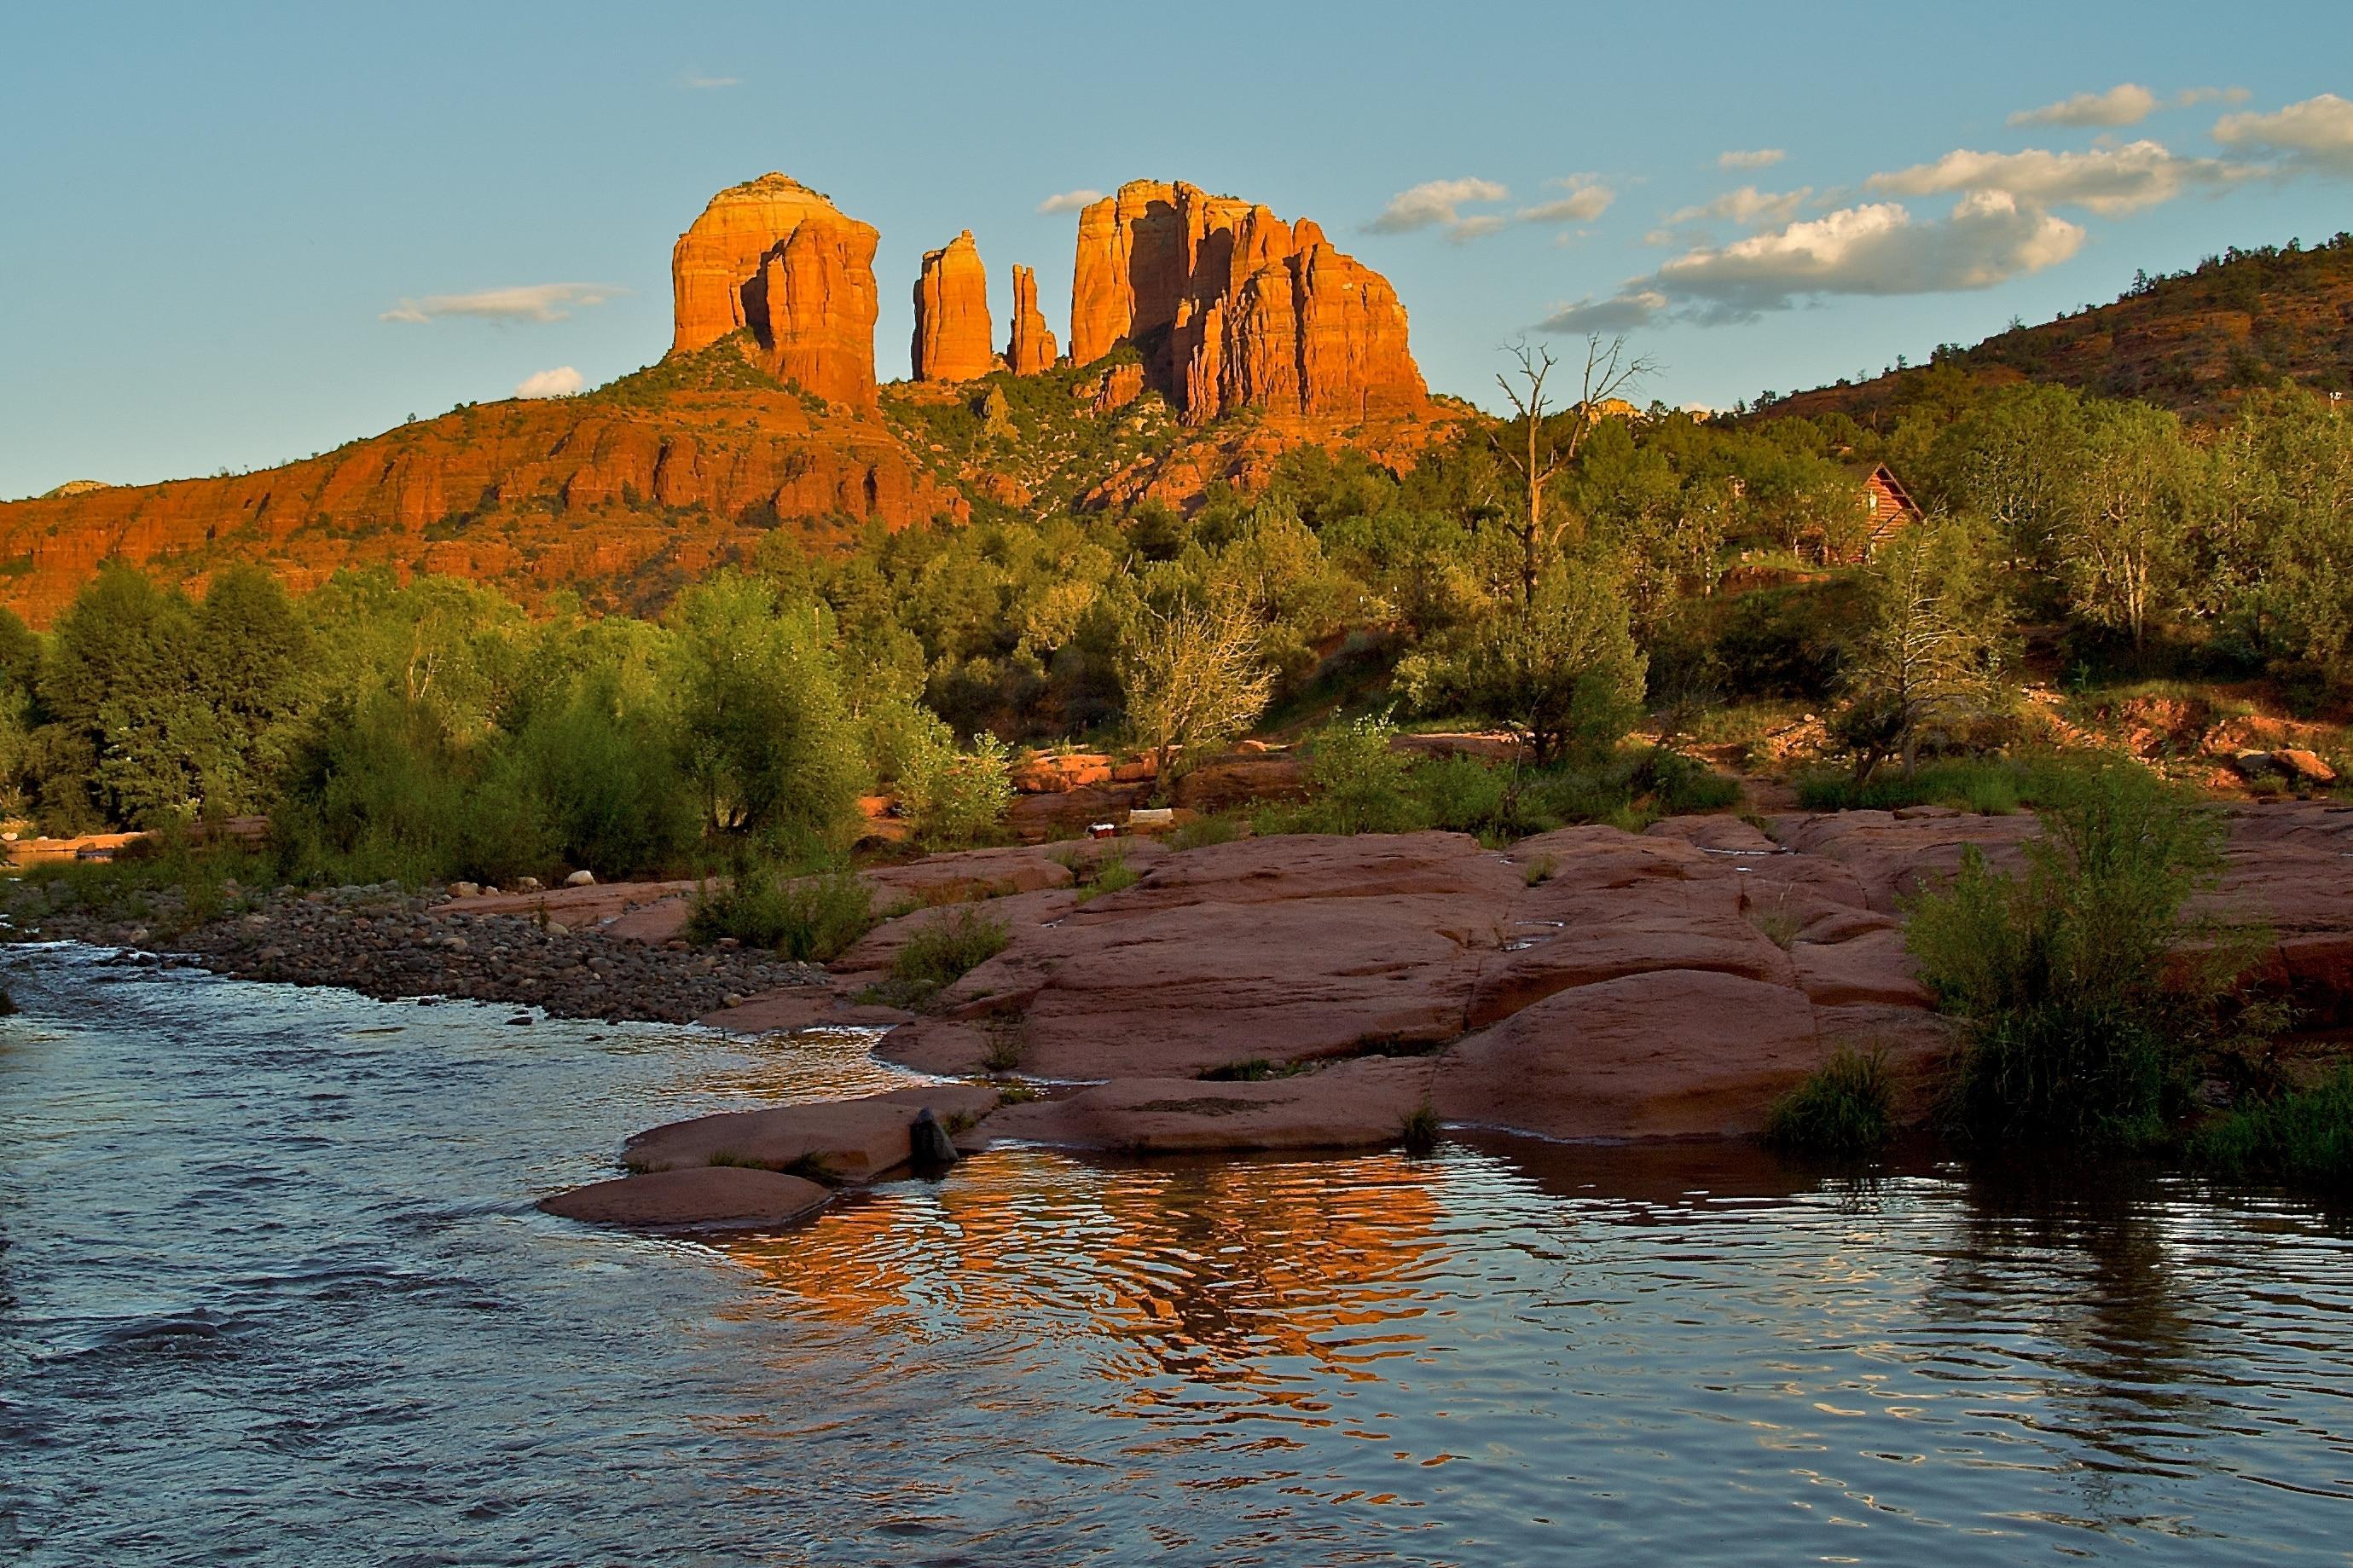 Oakcreek CC, Sedona, Arizona, United States of America